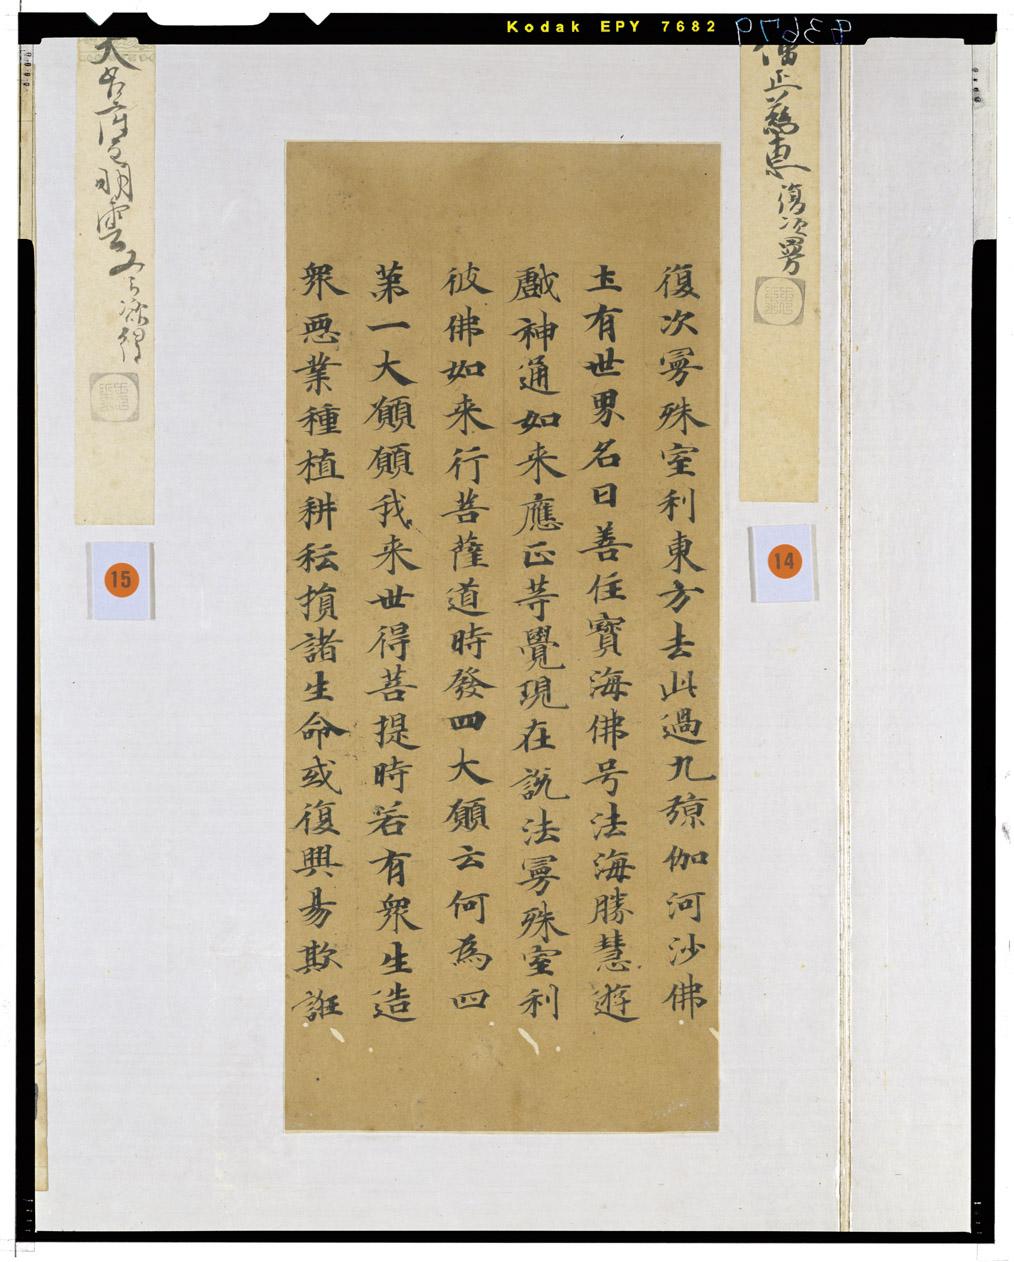 C0083679 古筆手鑑 - 東京国立博物館 画像検索